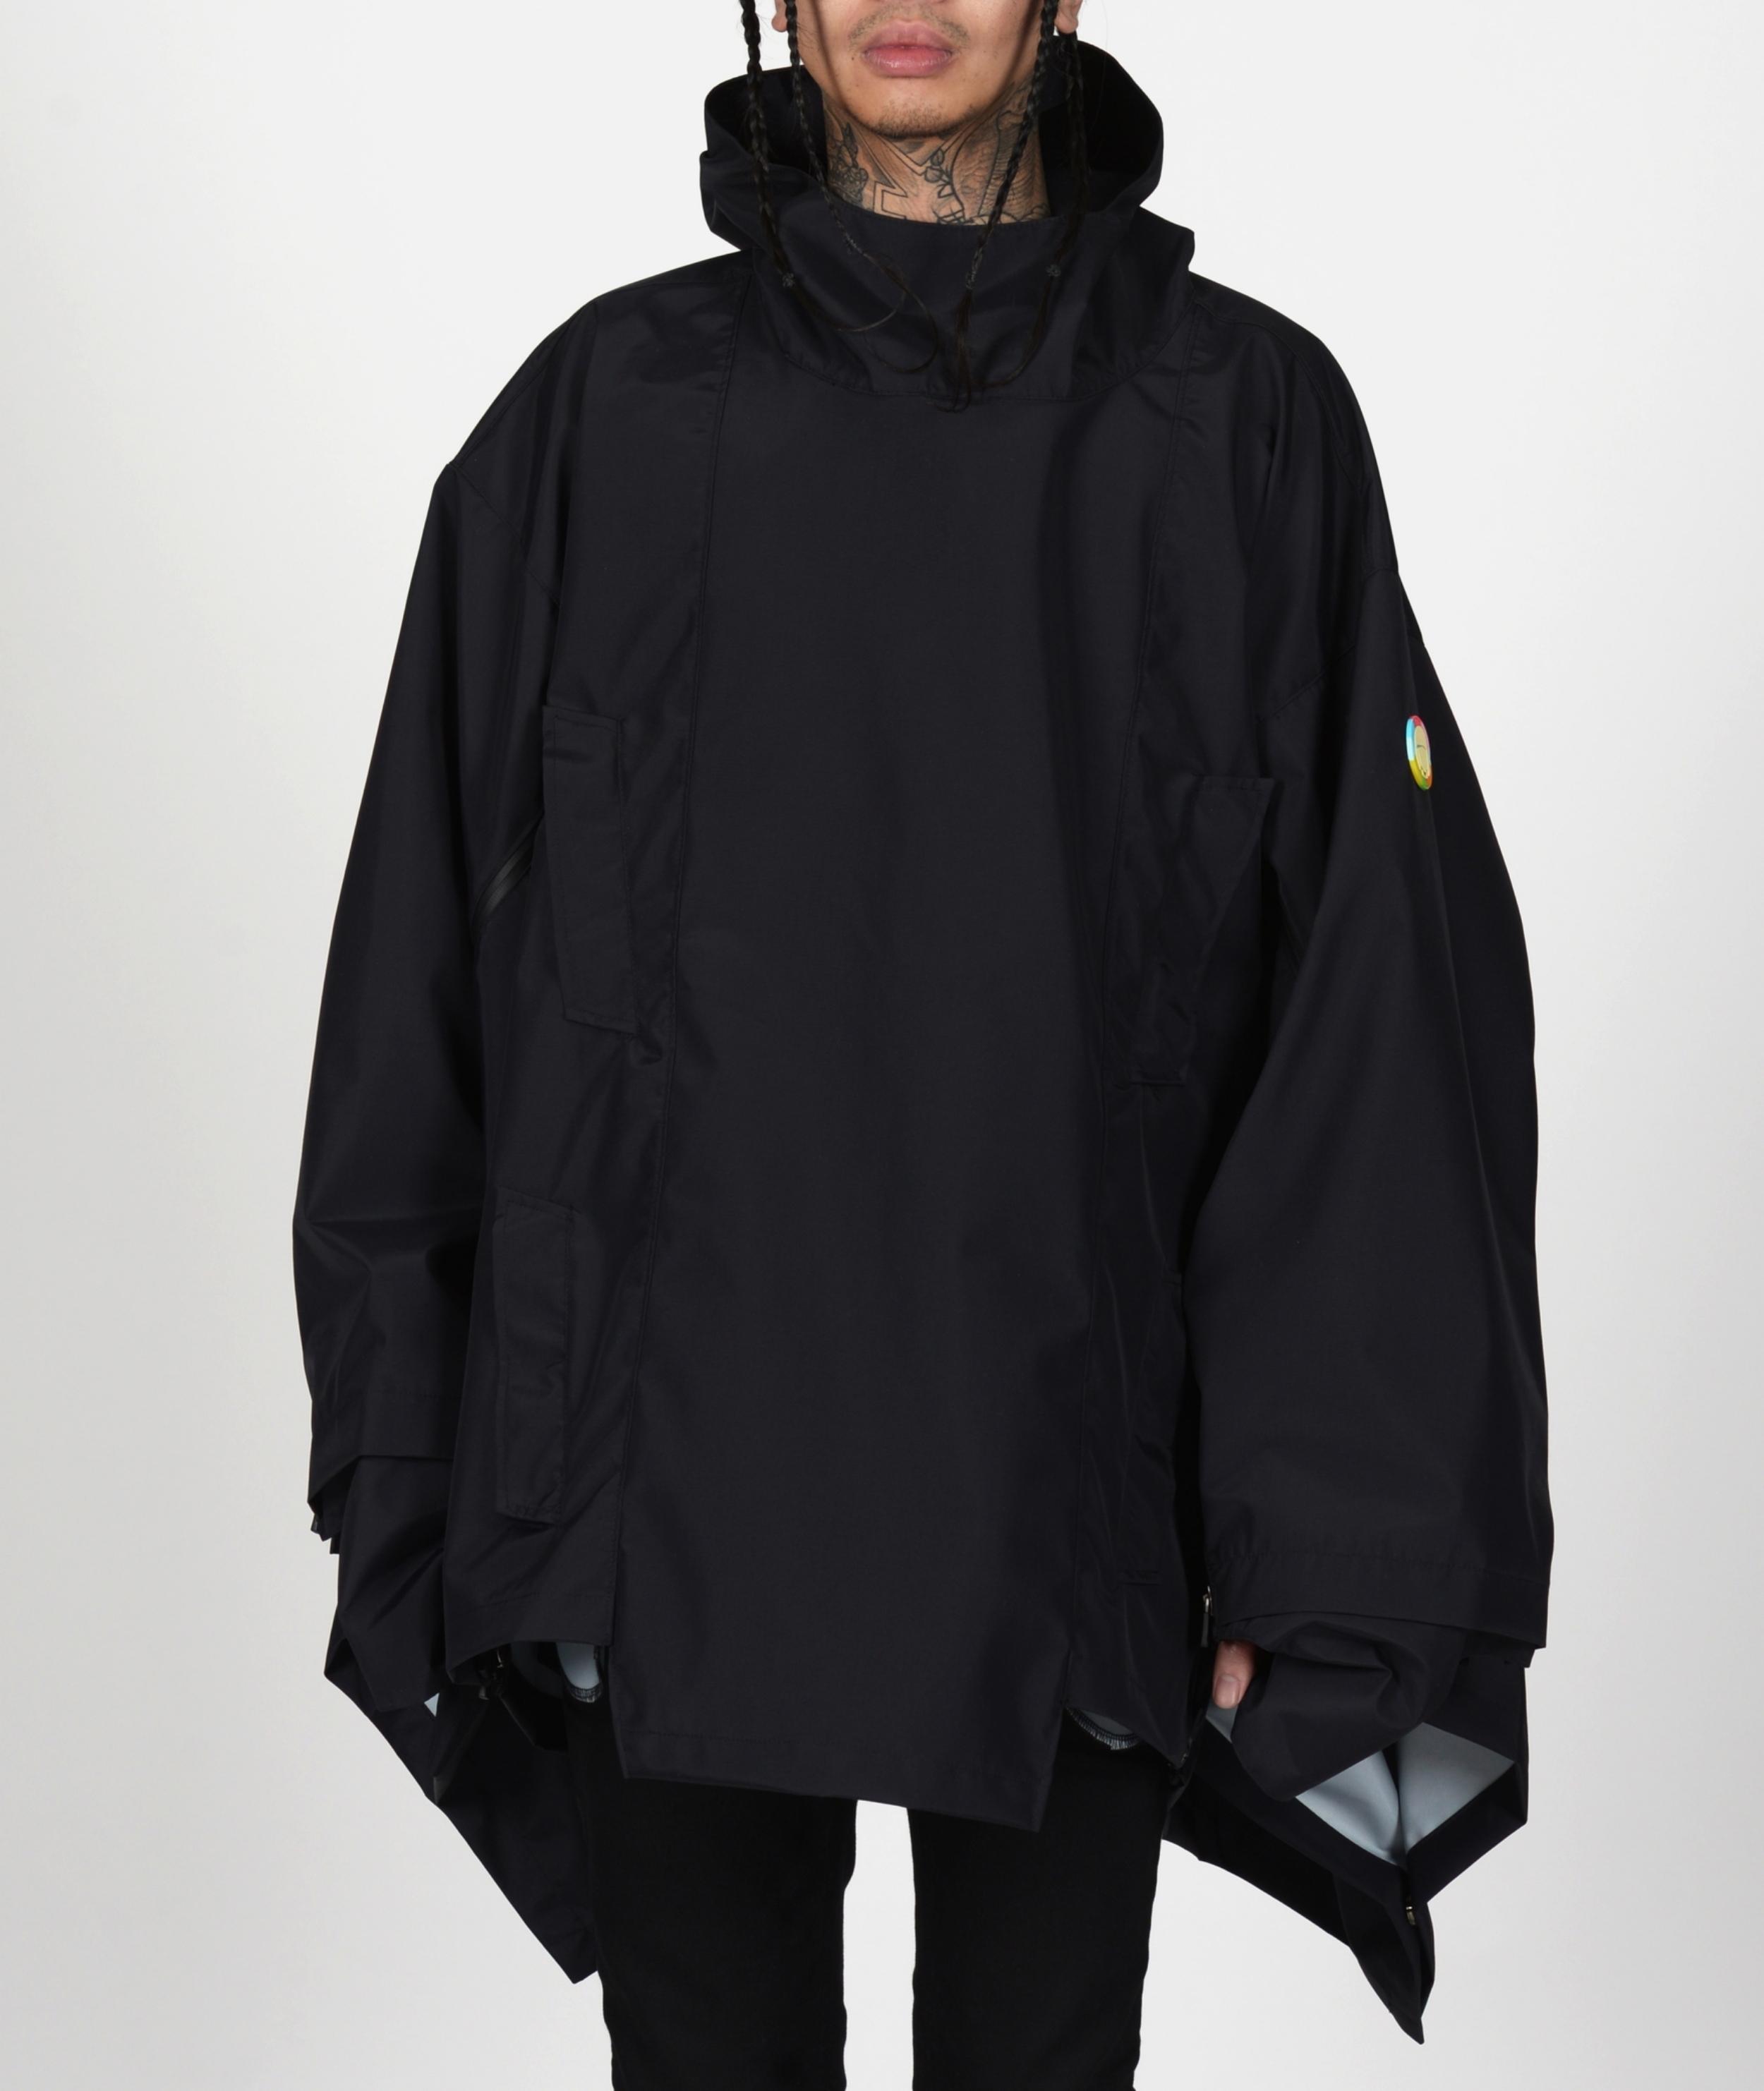 01 Heightened Sense Black Park Jacket.jpg